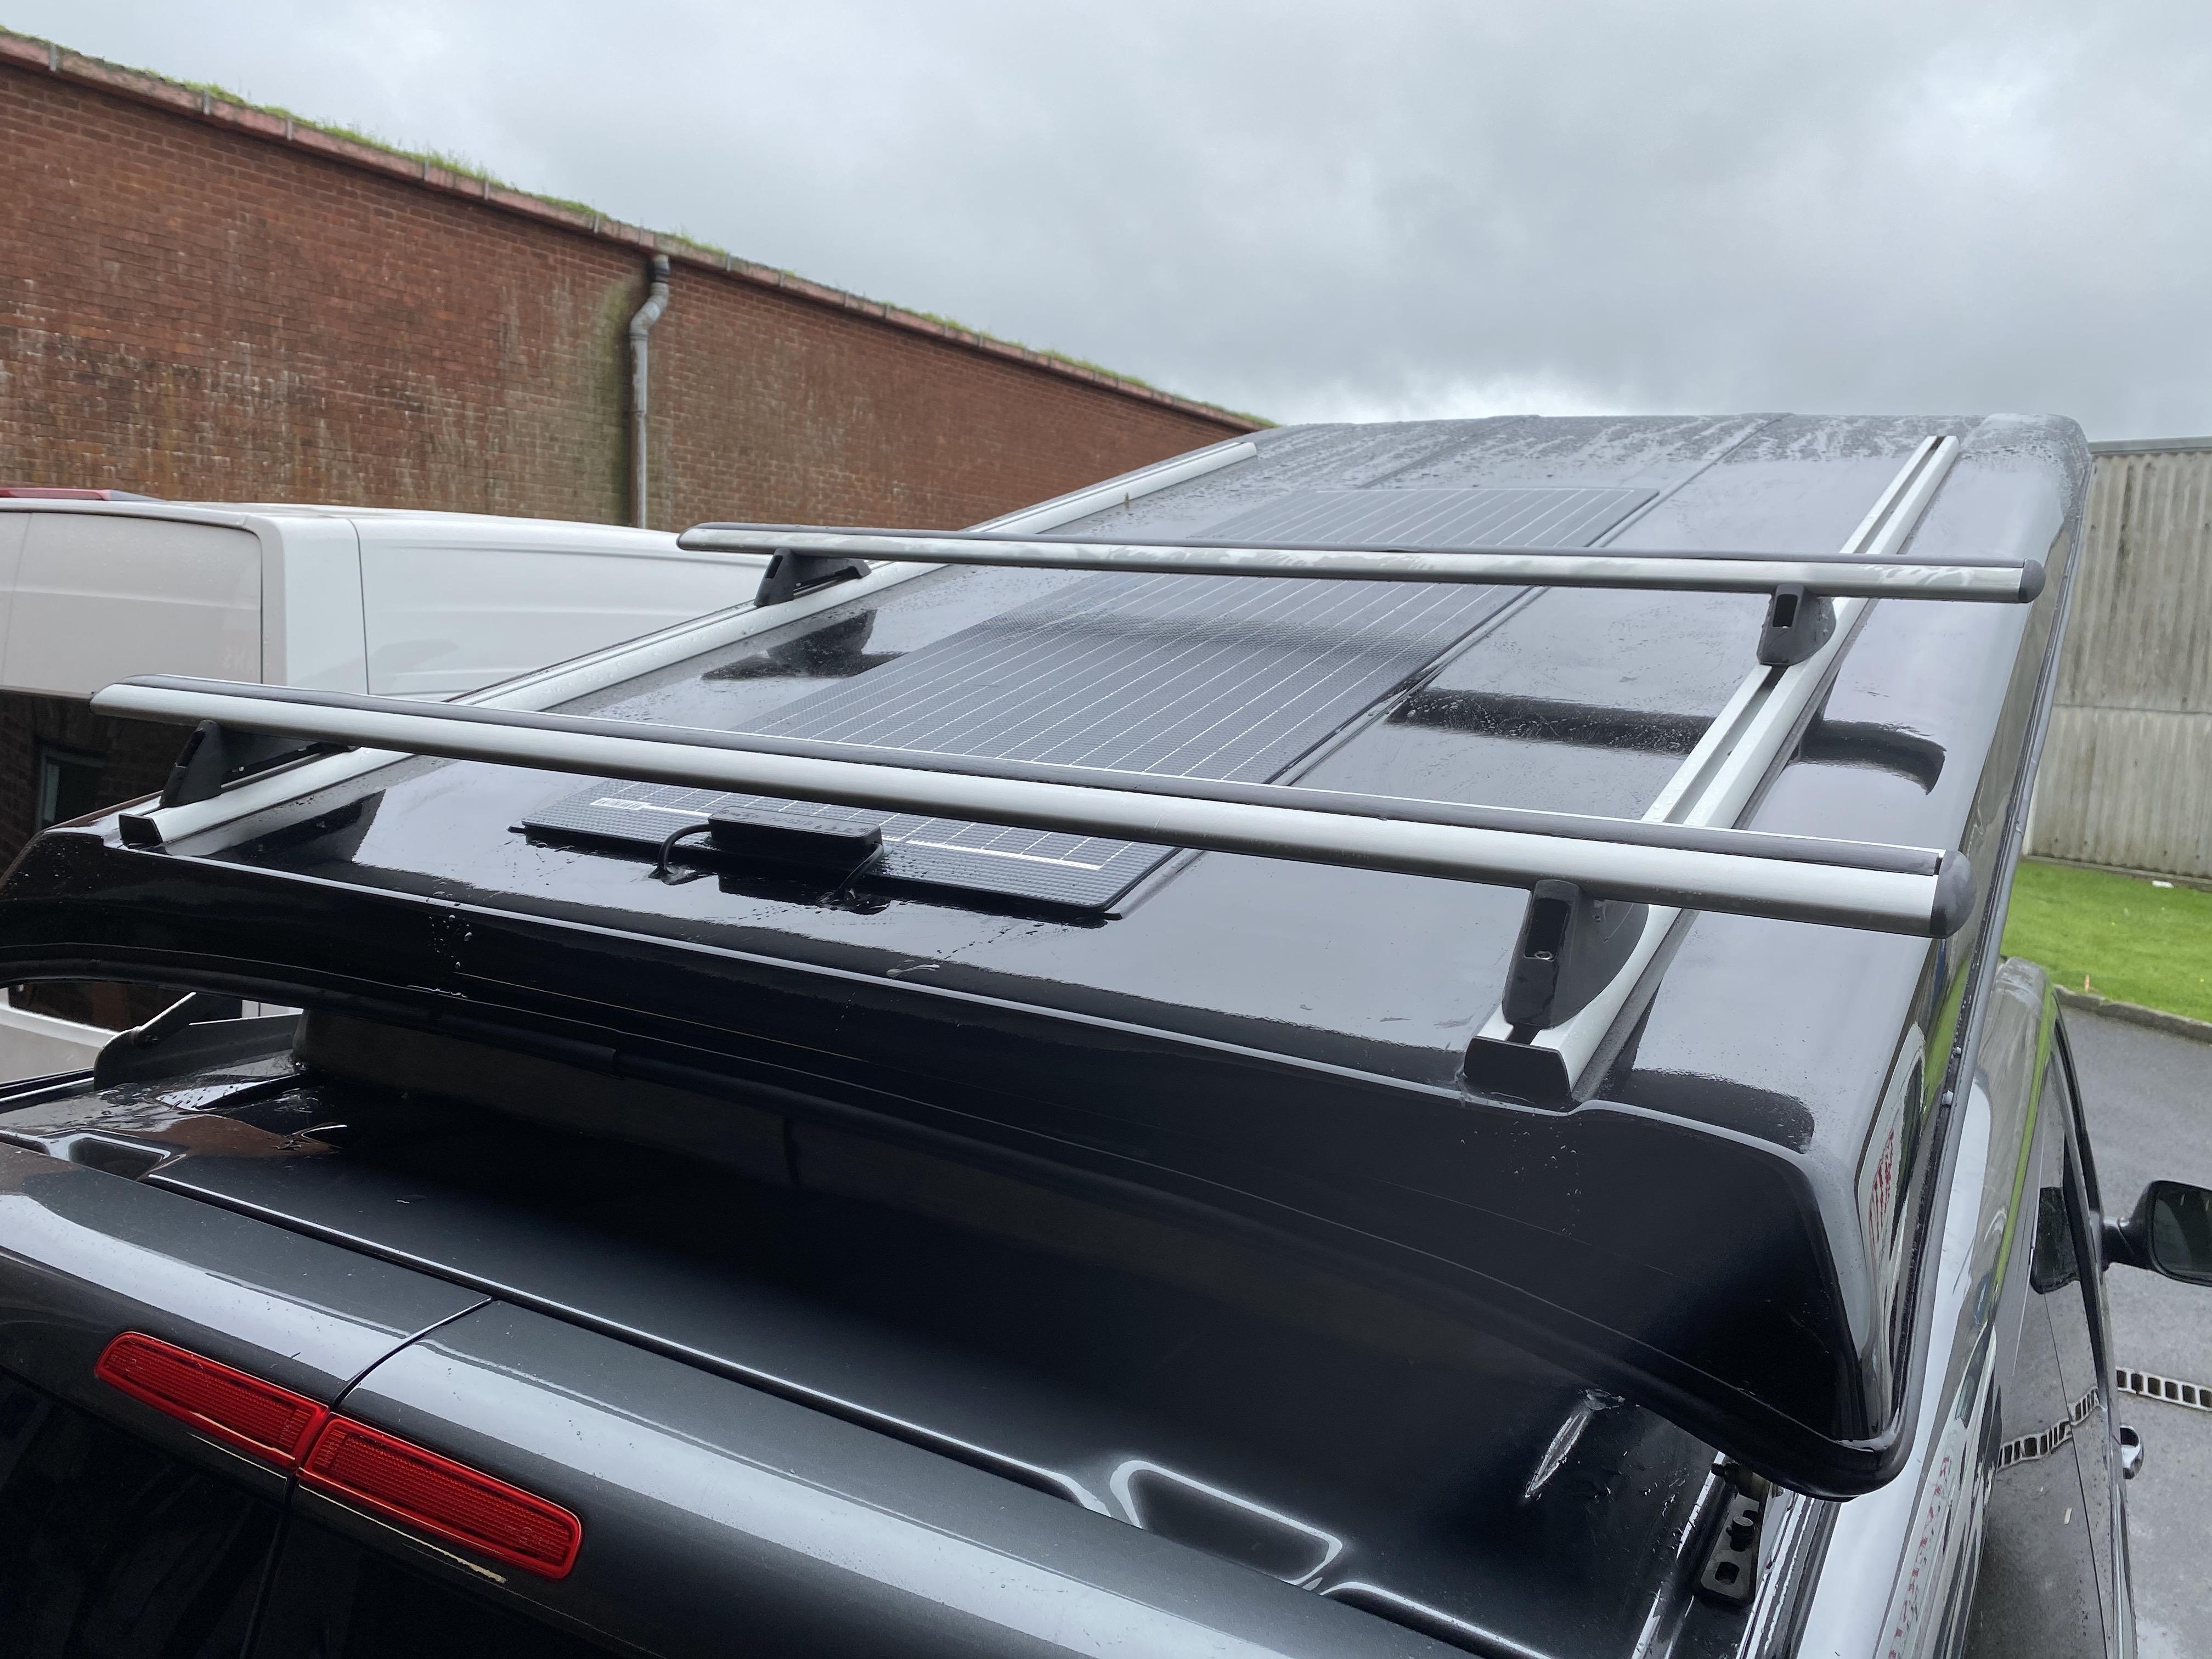 roof rack on a campervan conversion